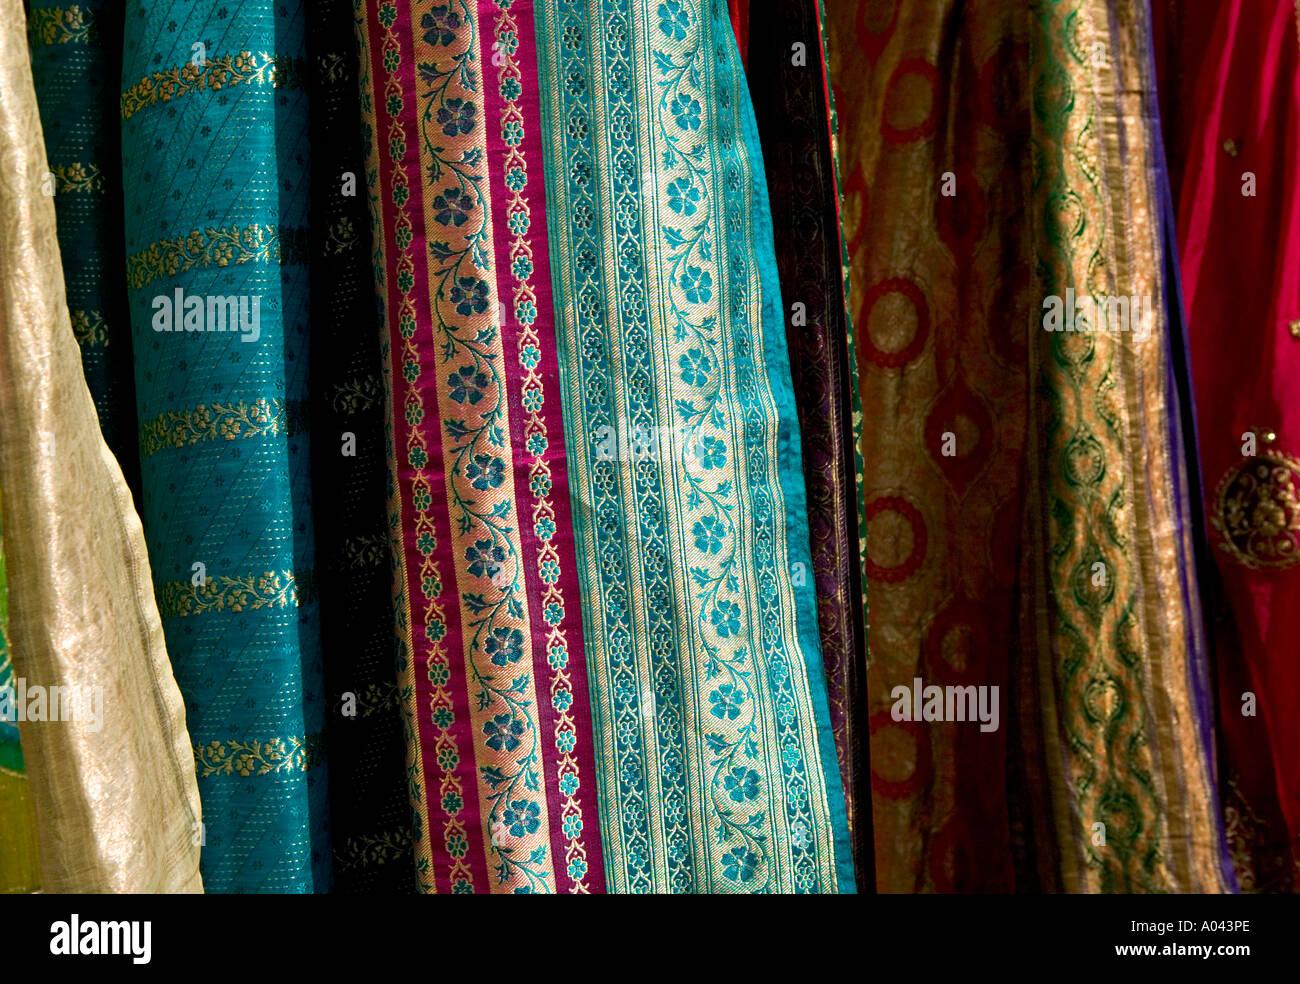 Silk fabrics, Delhi, India - Stock Image